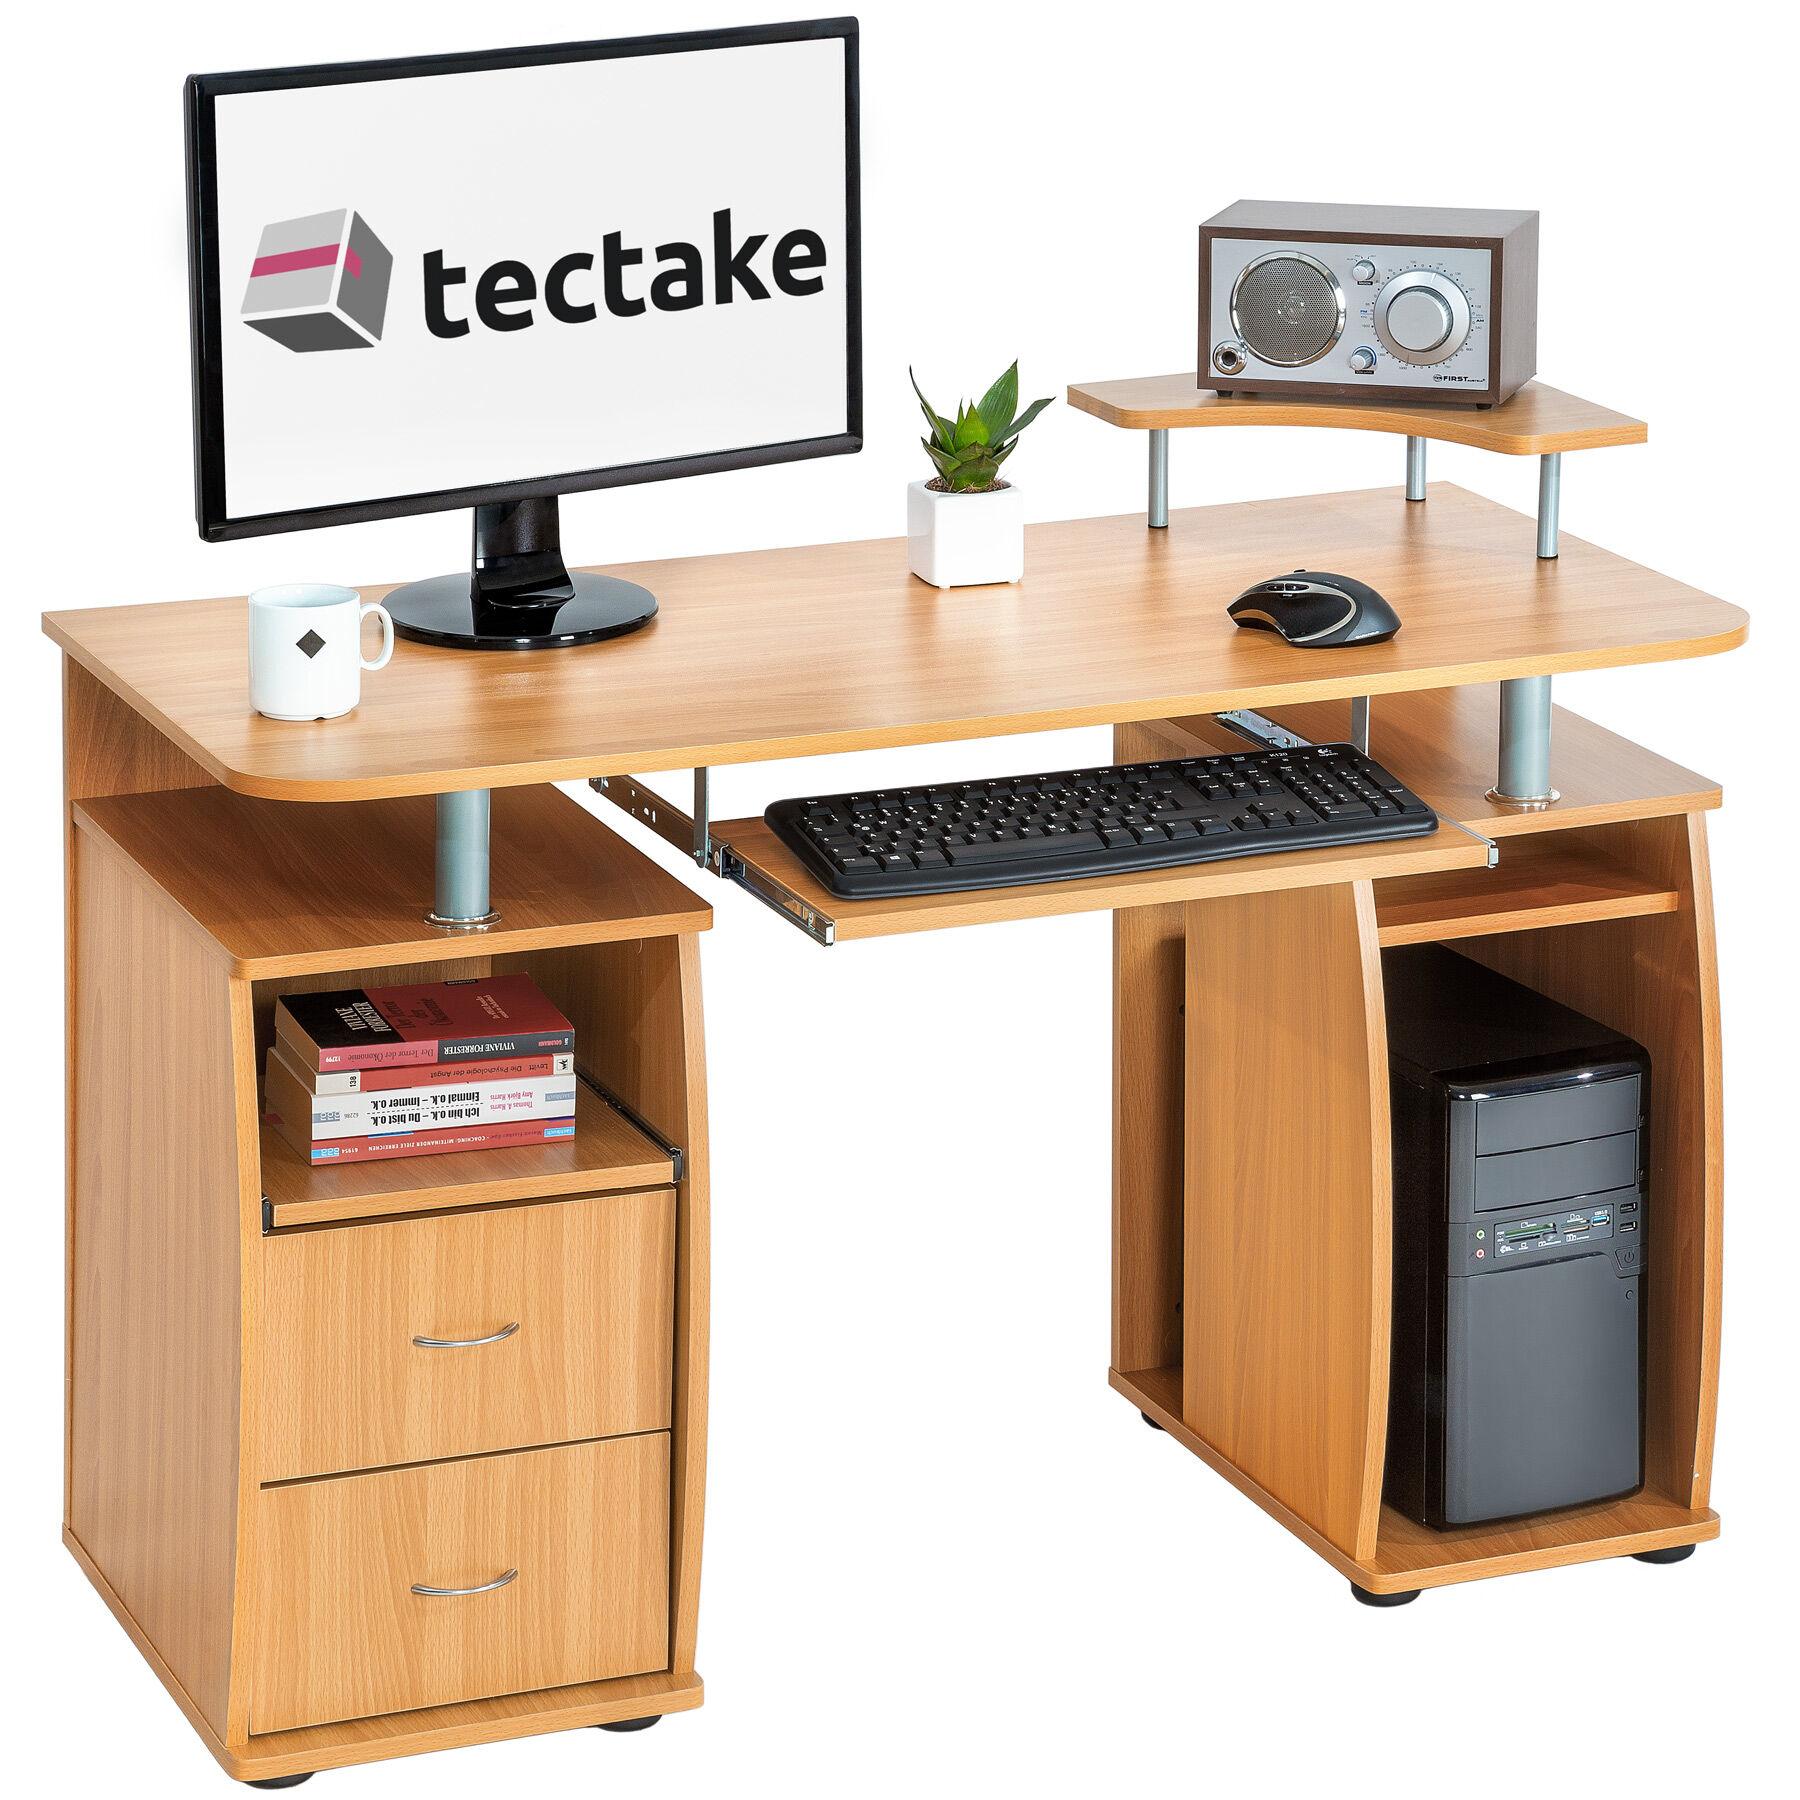 tectake Computer desk 115x55x87cm - beech